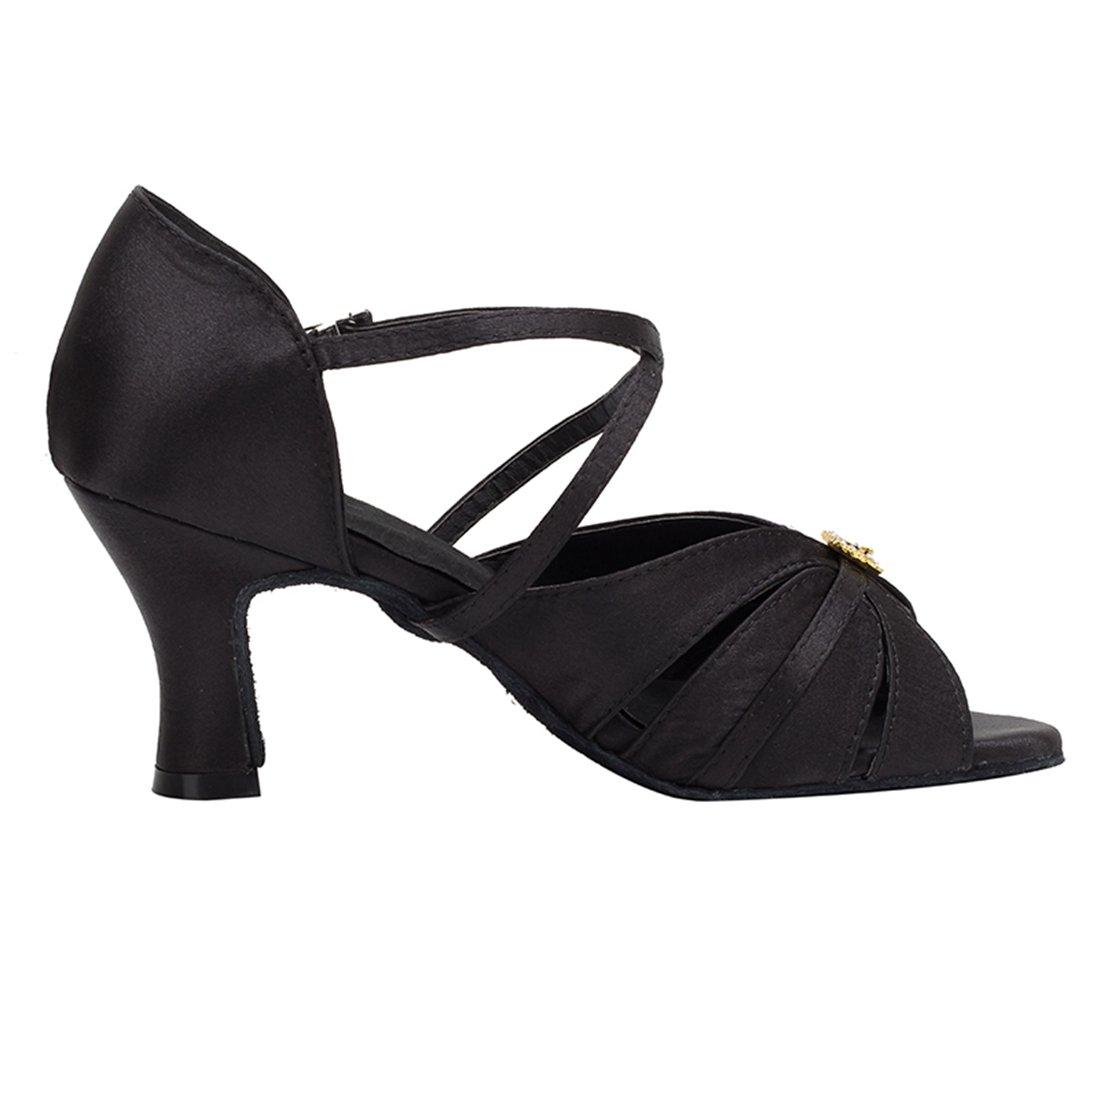 Miyoopark Womens Cuban Heel Ankle Strap Satin Latin Ballroom Dance Shoes Prom Evening Sandals